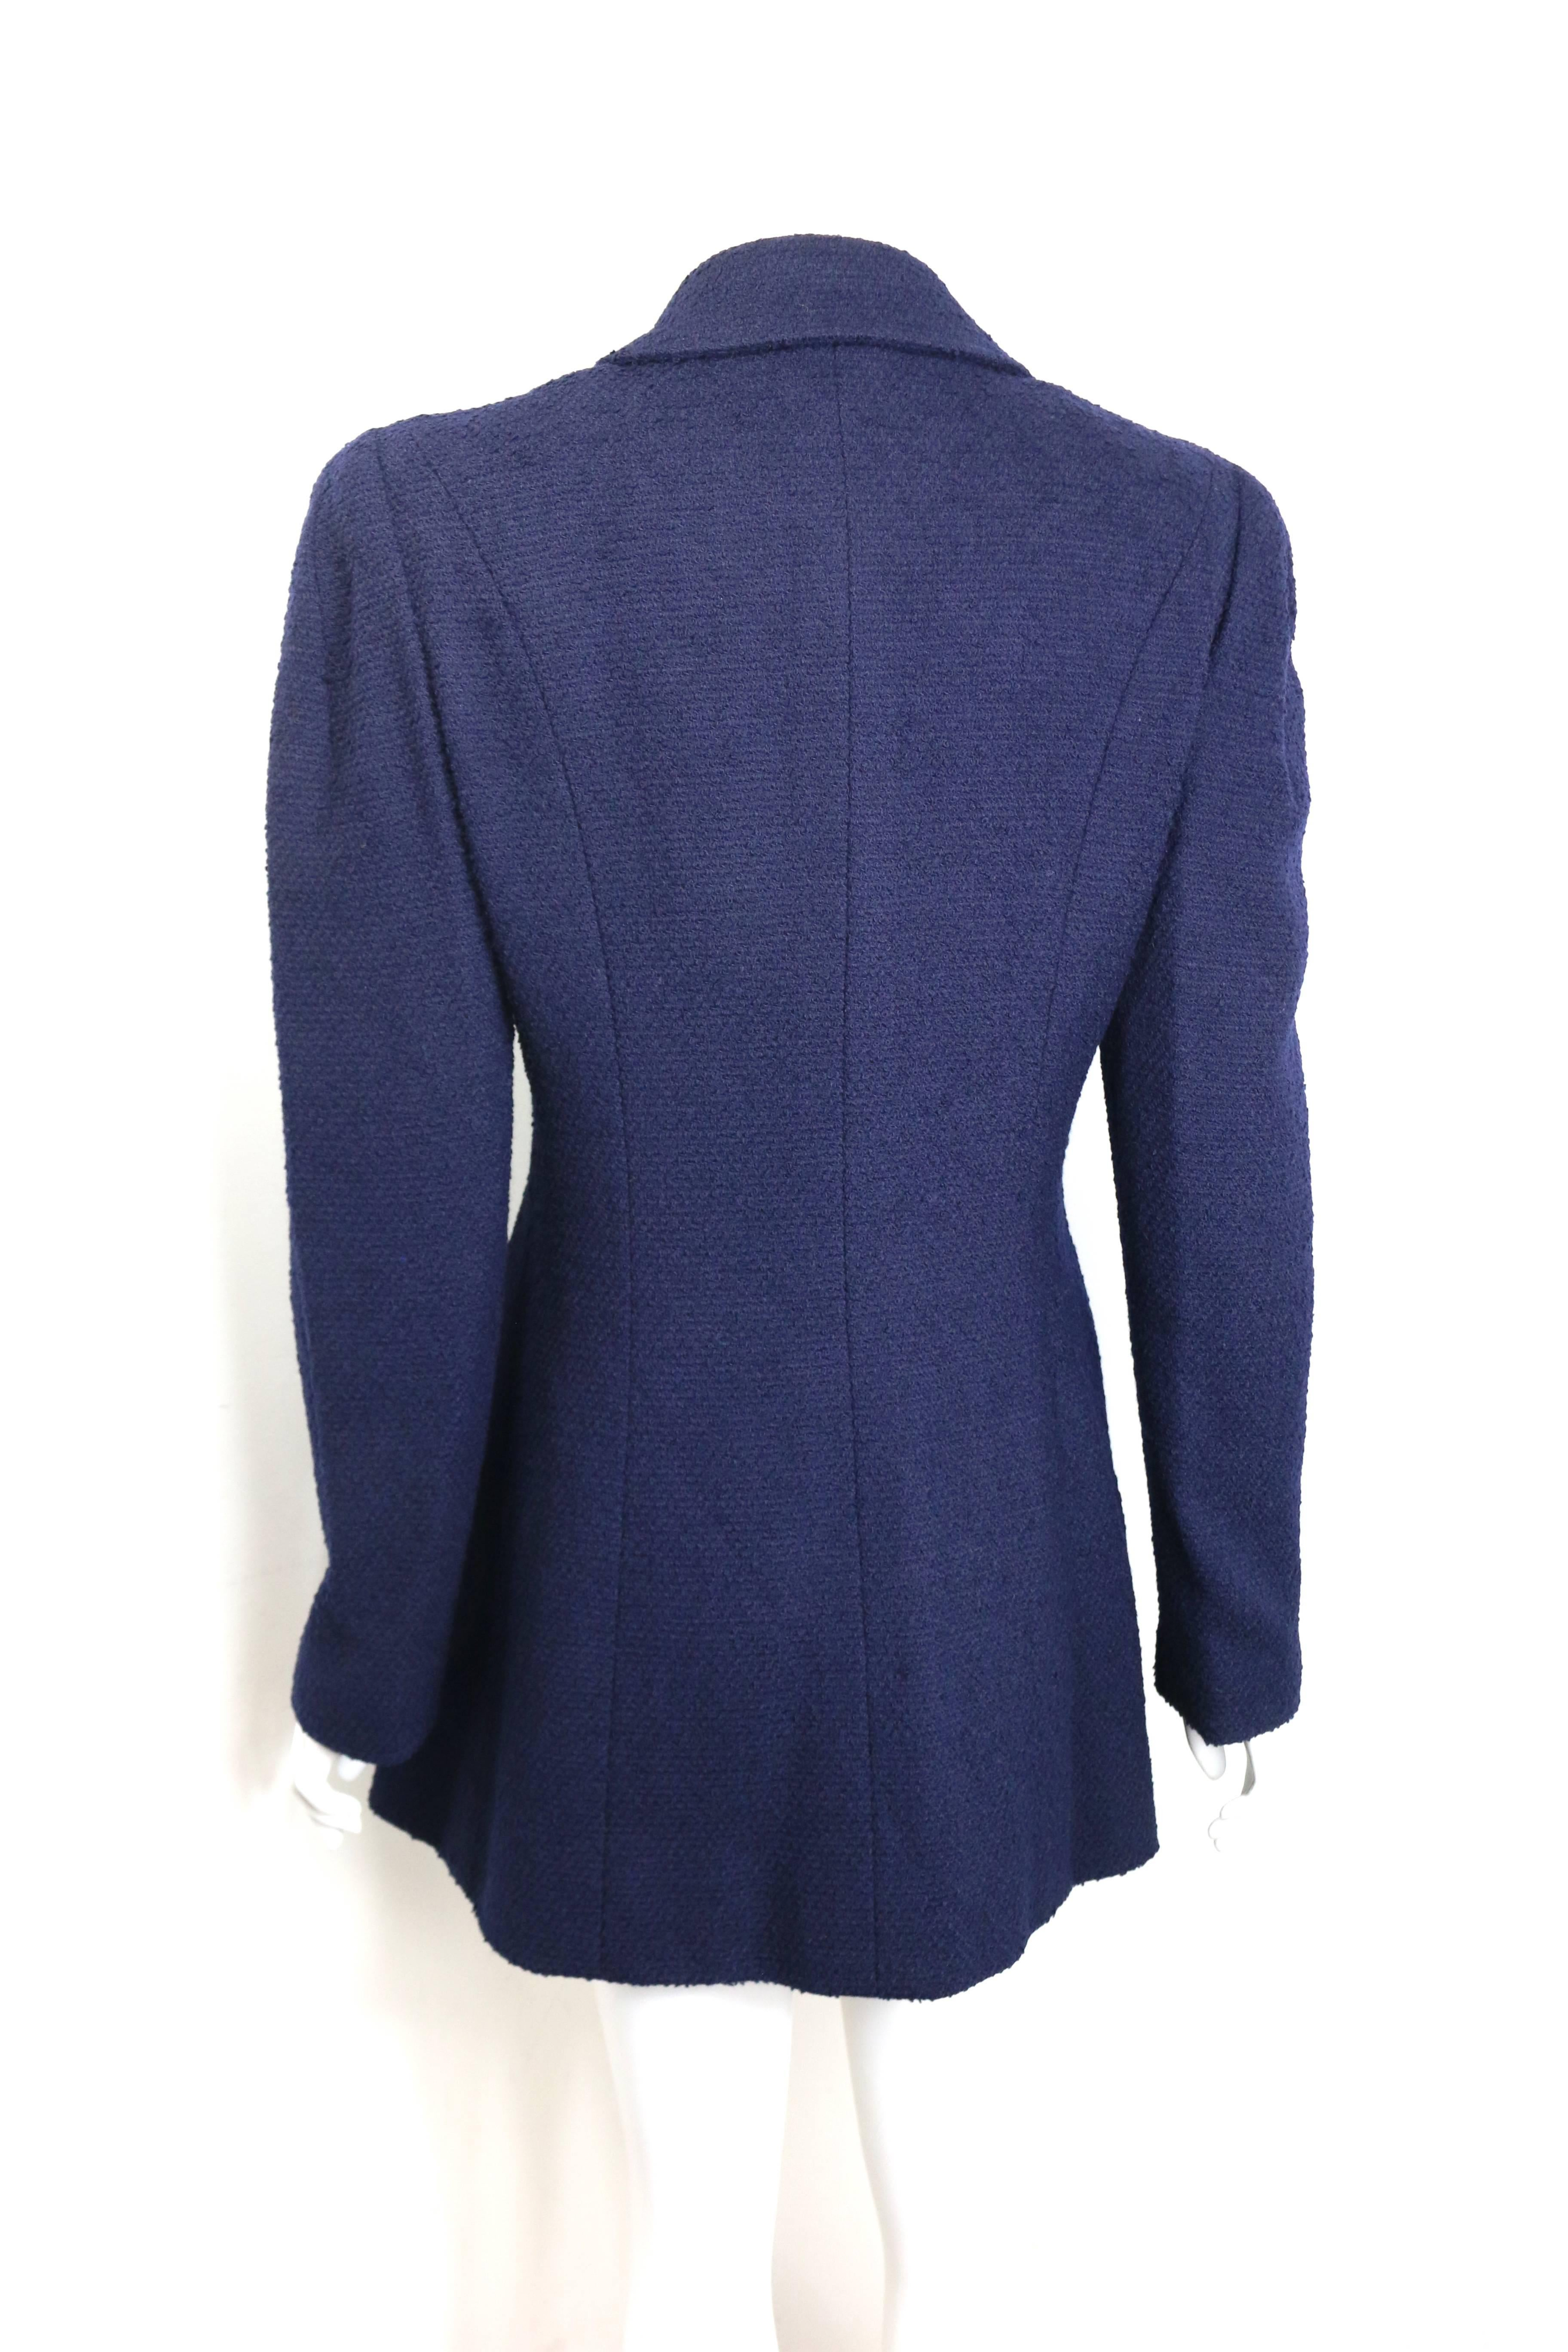 7243674ff Chanel Dark Navy Boucle Wool Jacket